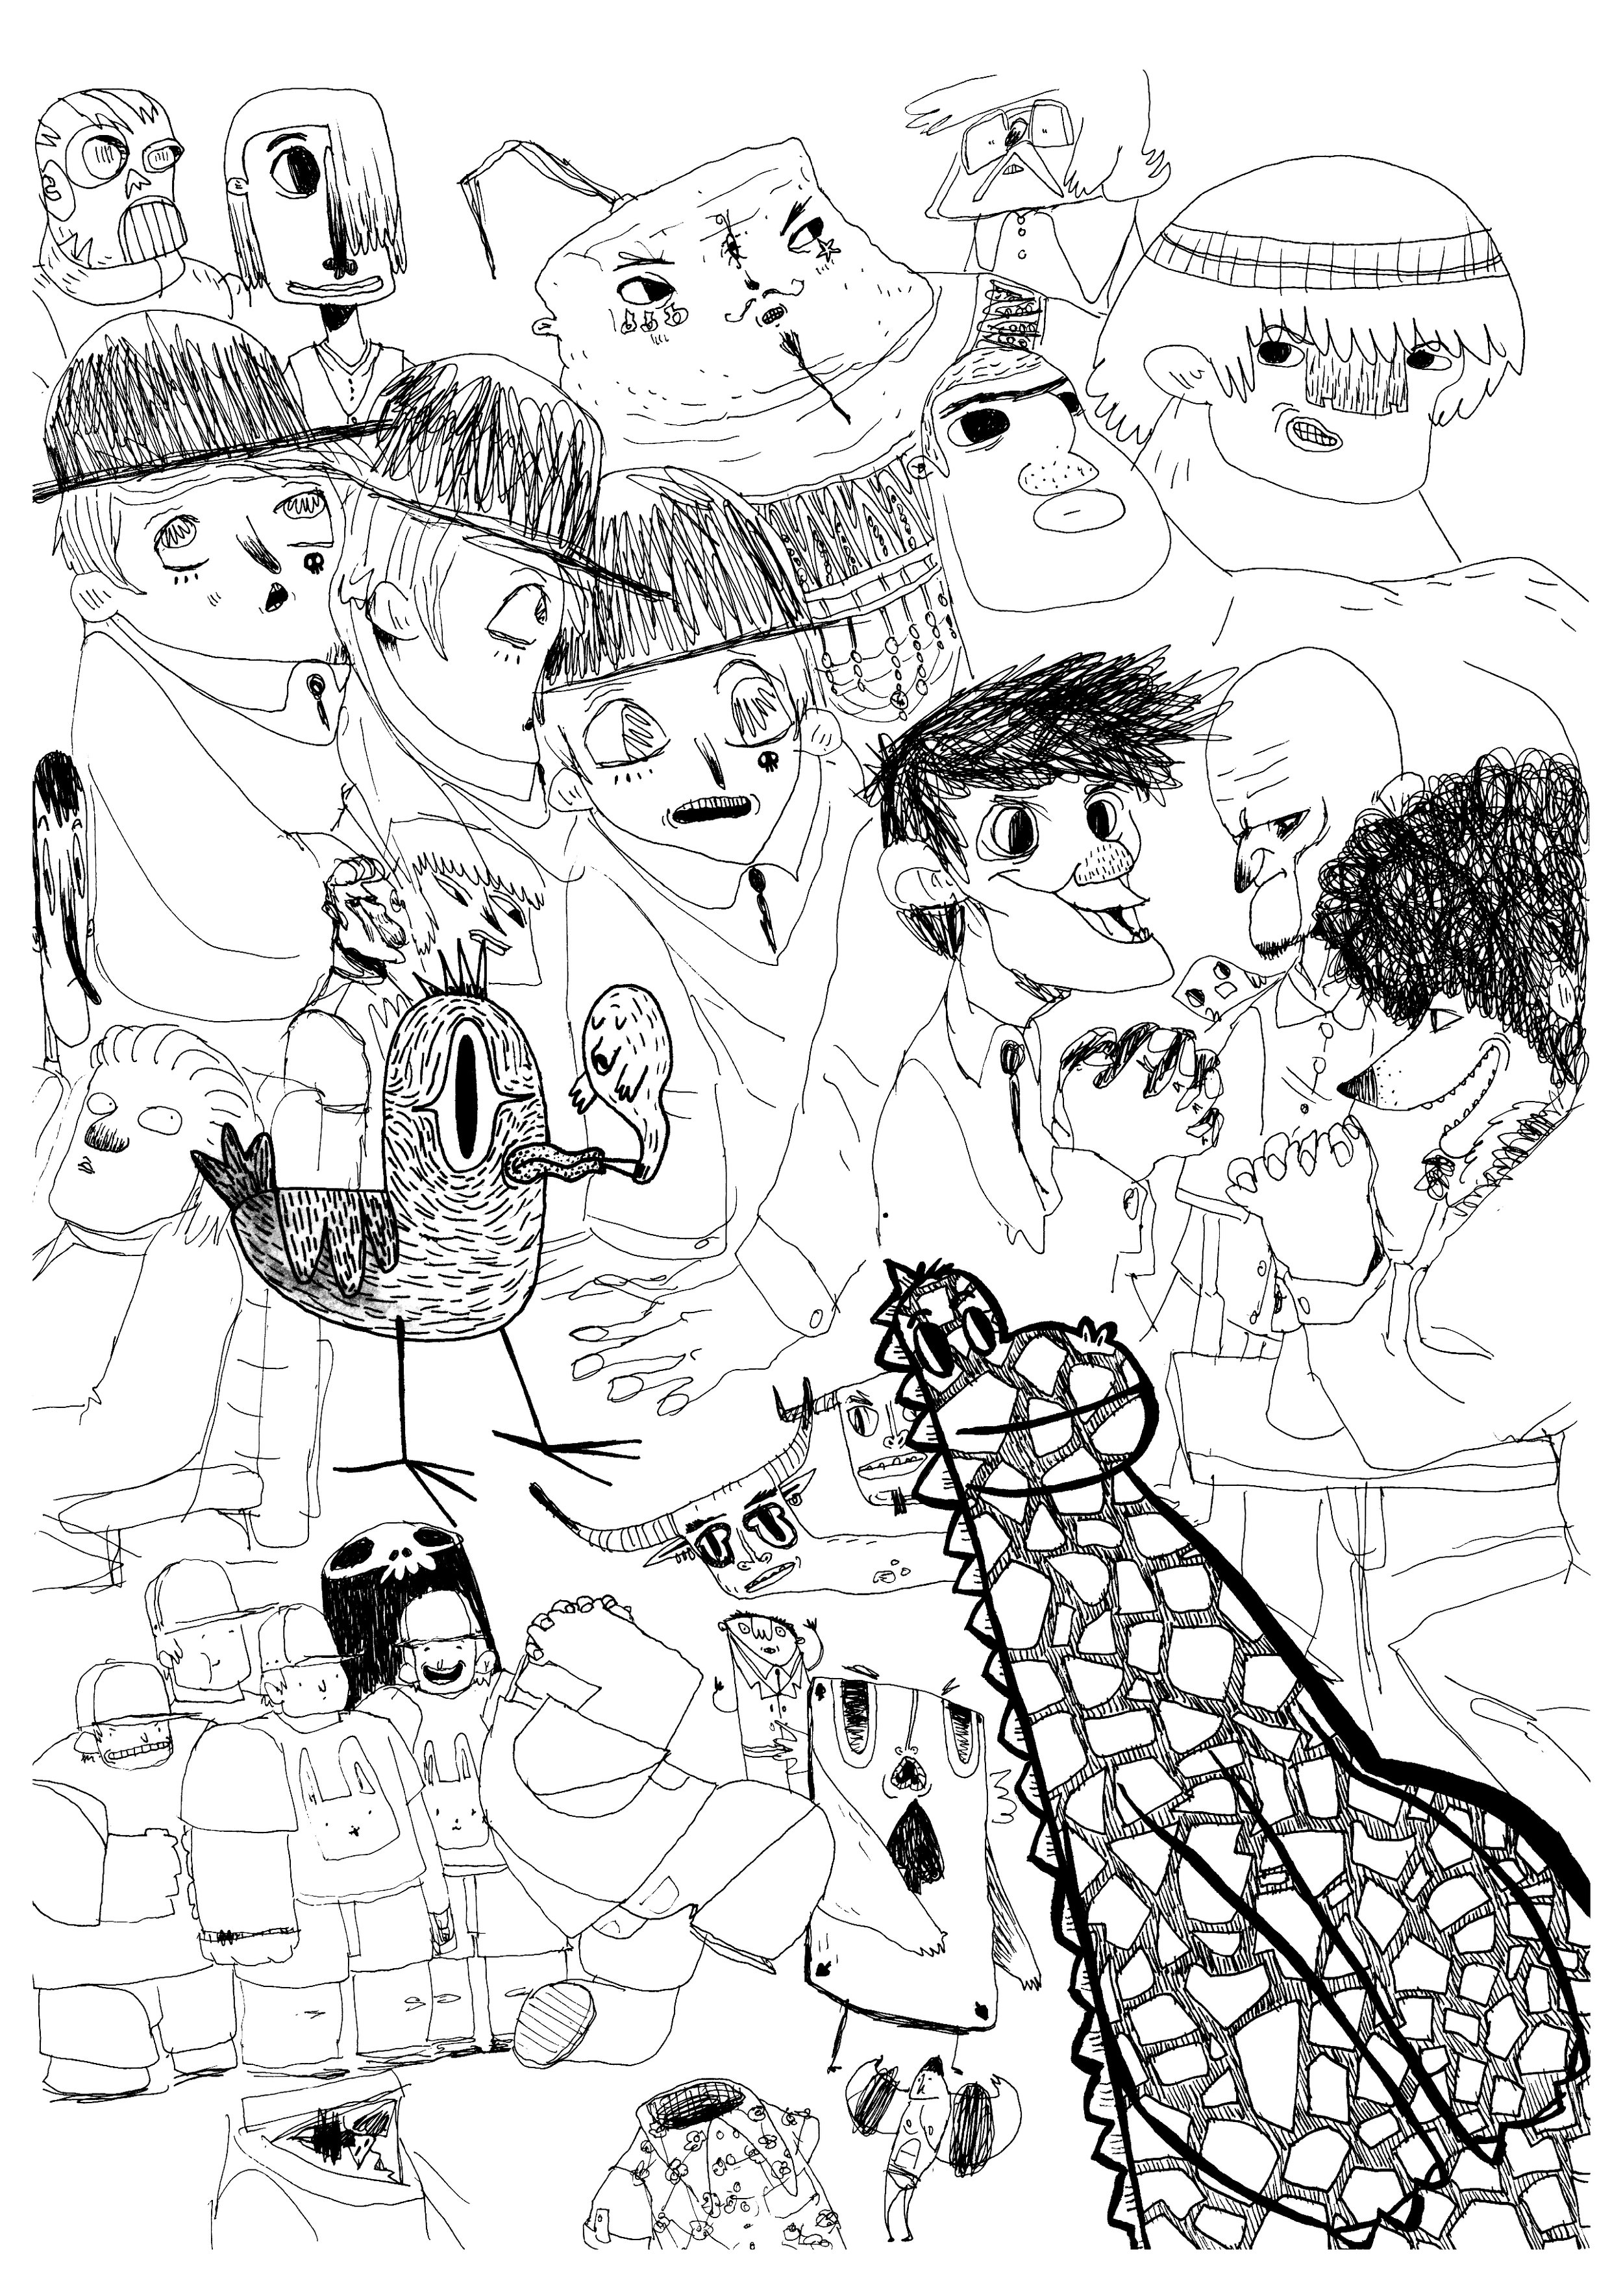 Pascal_Zaffiro_Doodle_9.jpg